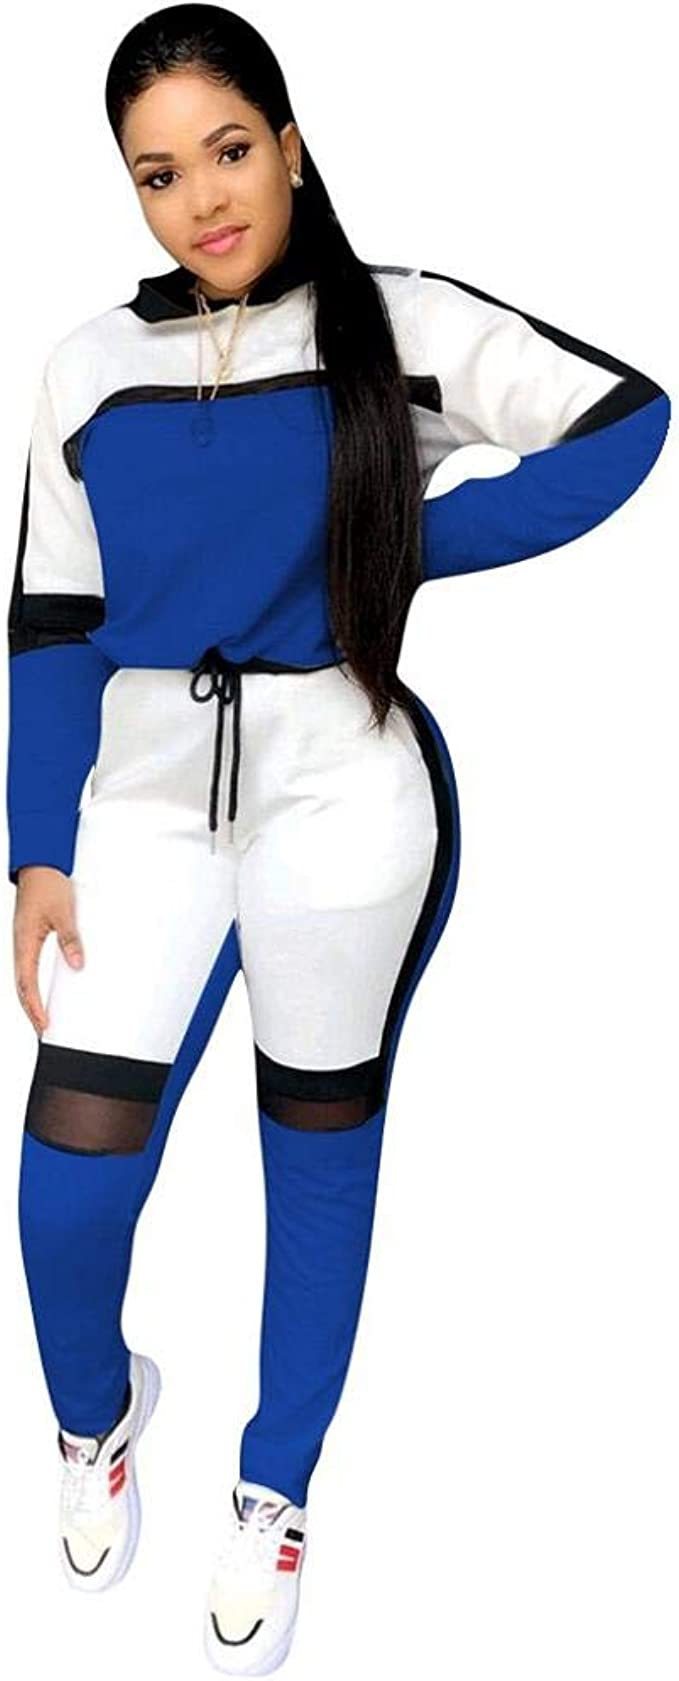 Chandal Mujer Deporte Conjunto 4 Colores Manga Larga Sudadera y ...